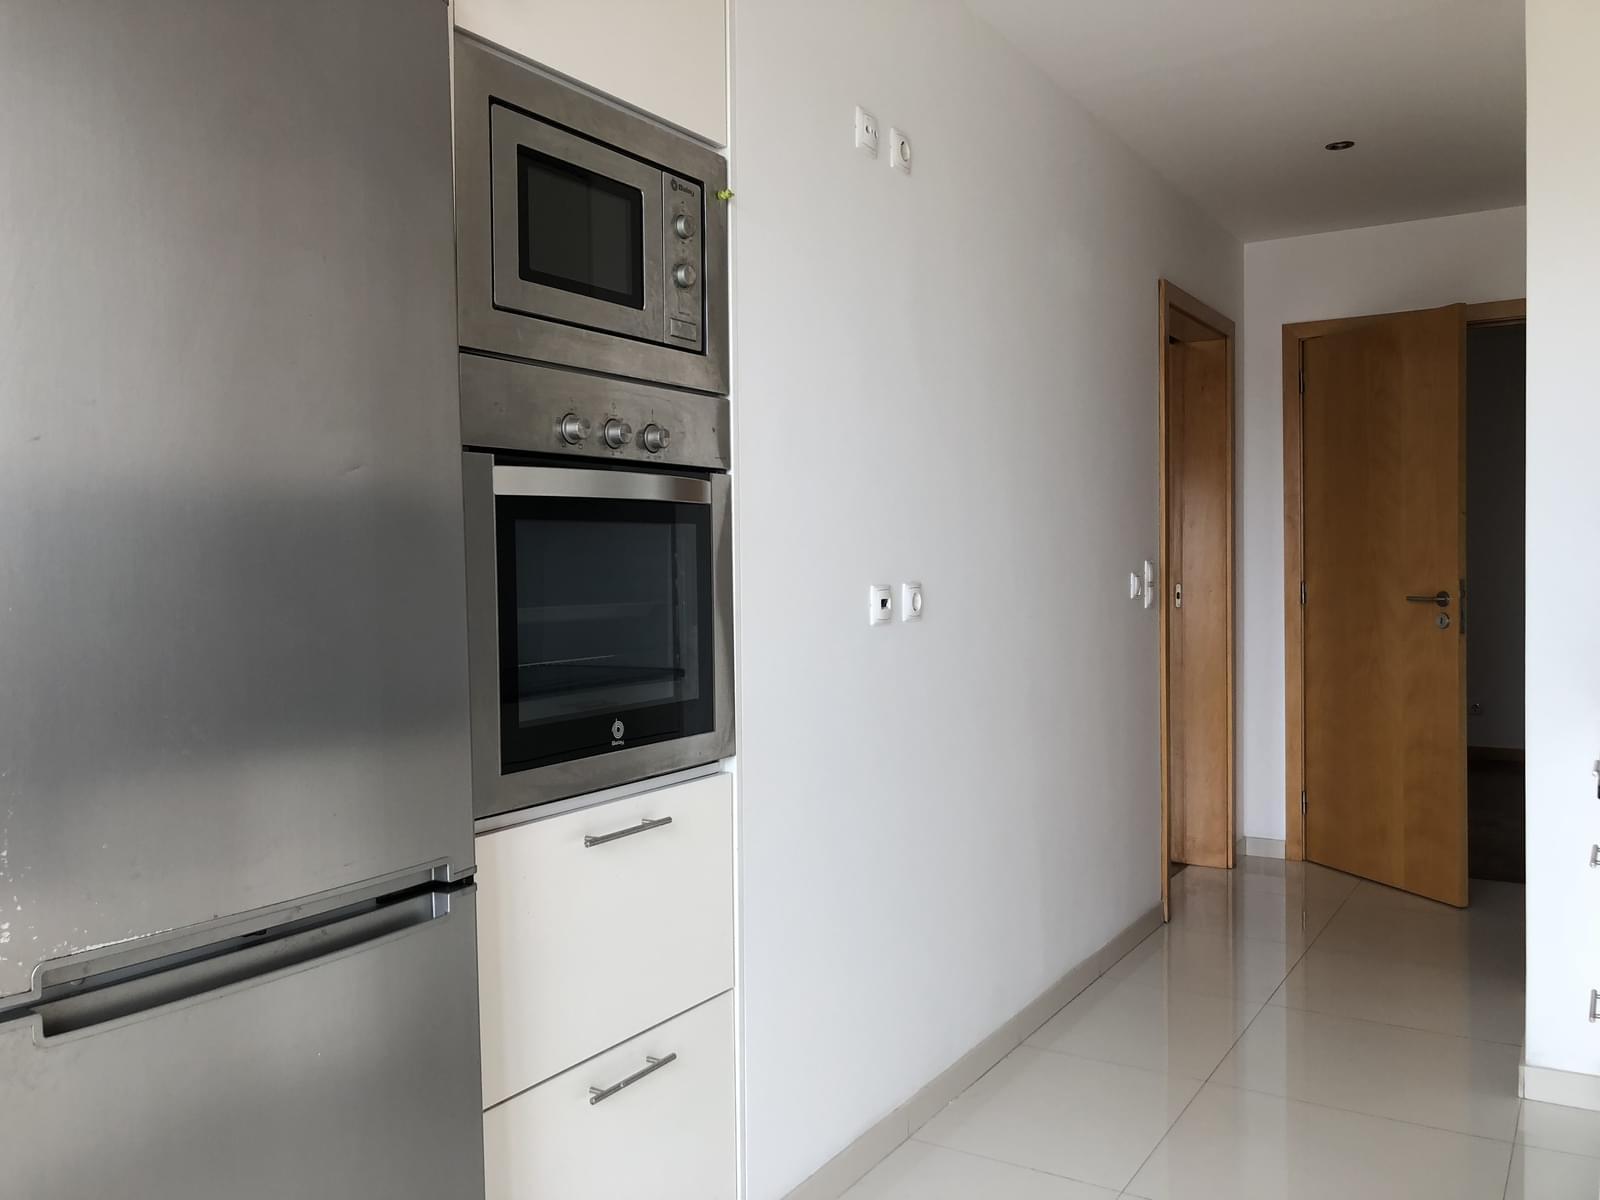 pf18040-apartamento-t3-lisboa-7315fe1a-c952-4713-9fe6-807fe59eed53